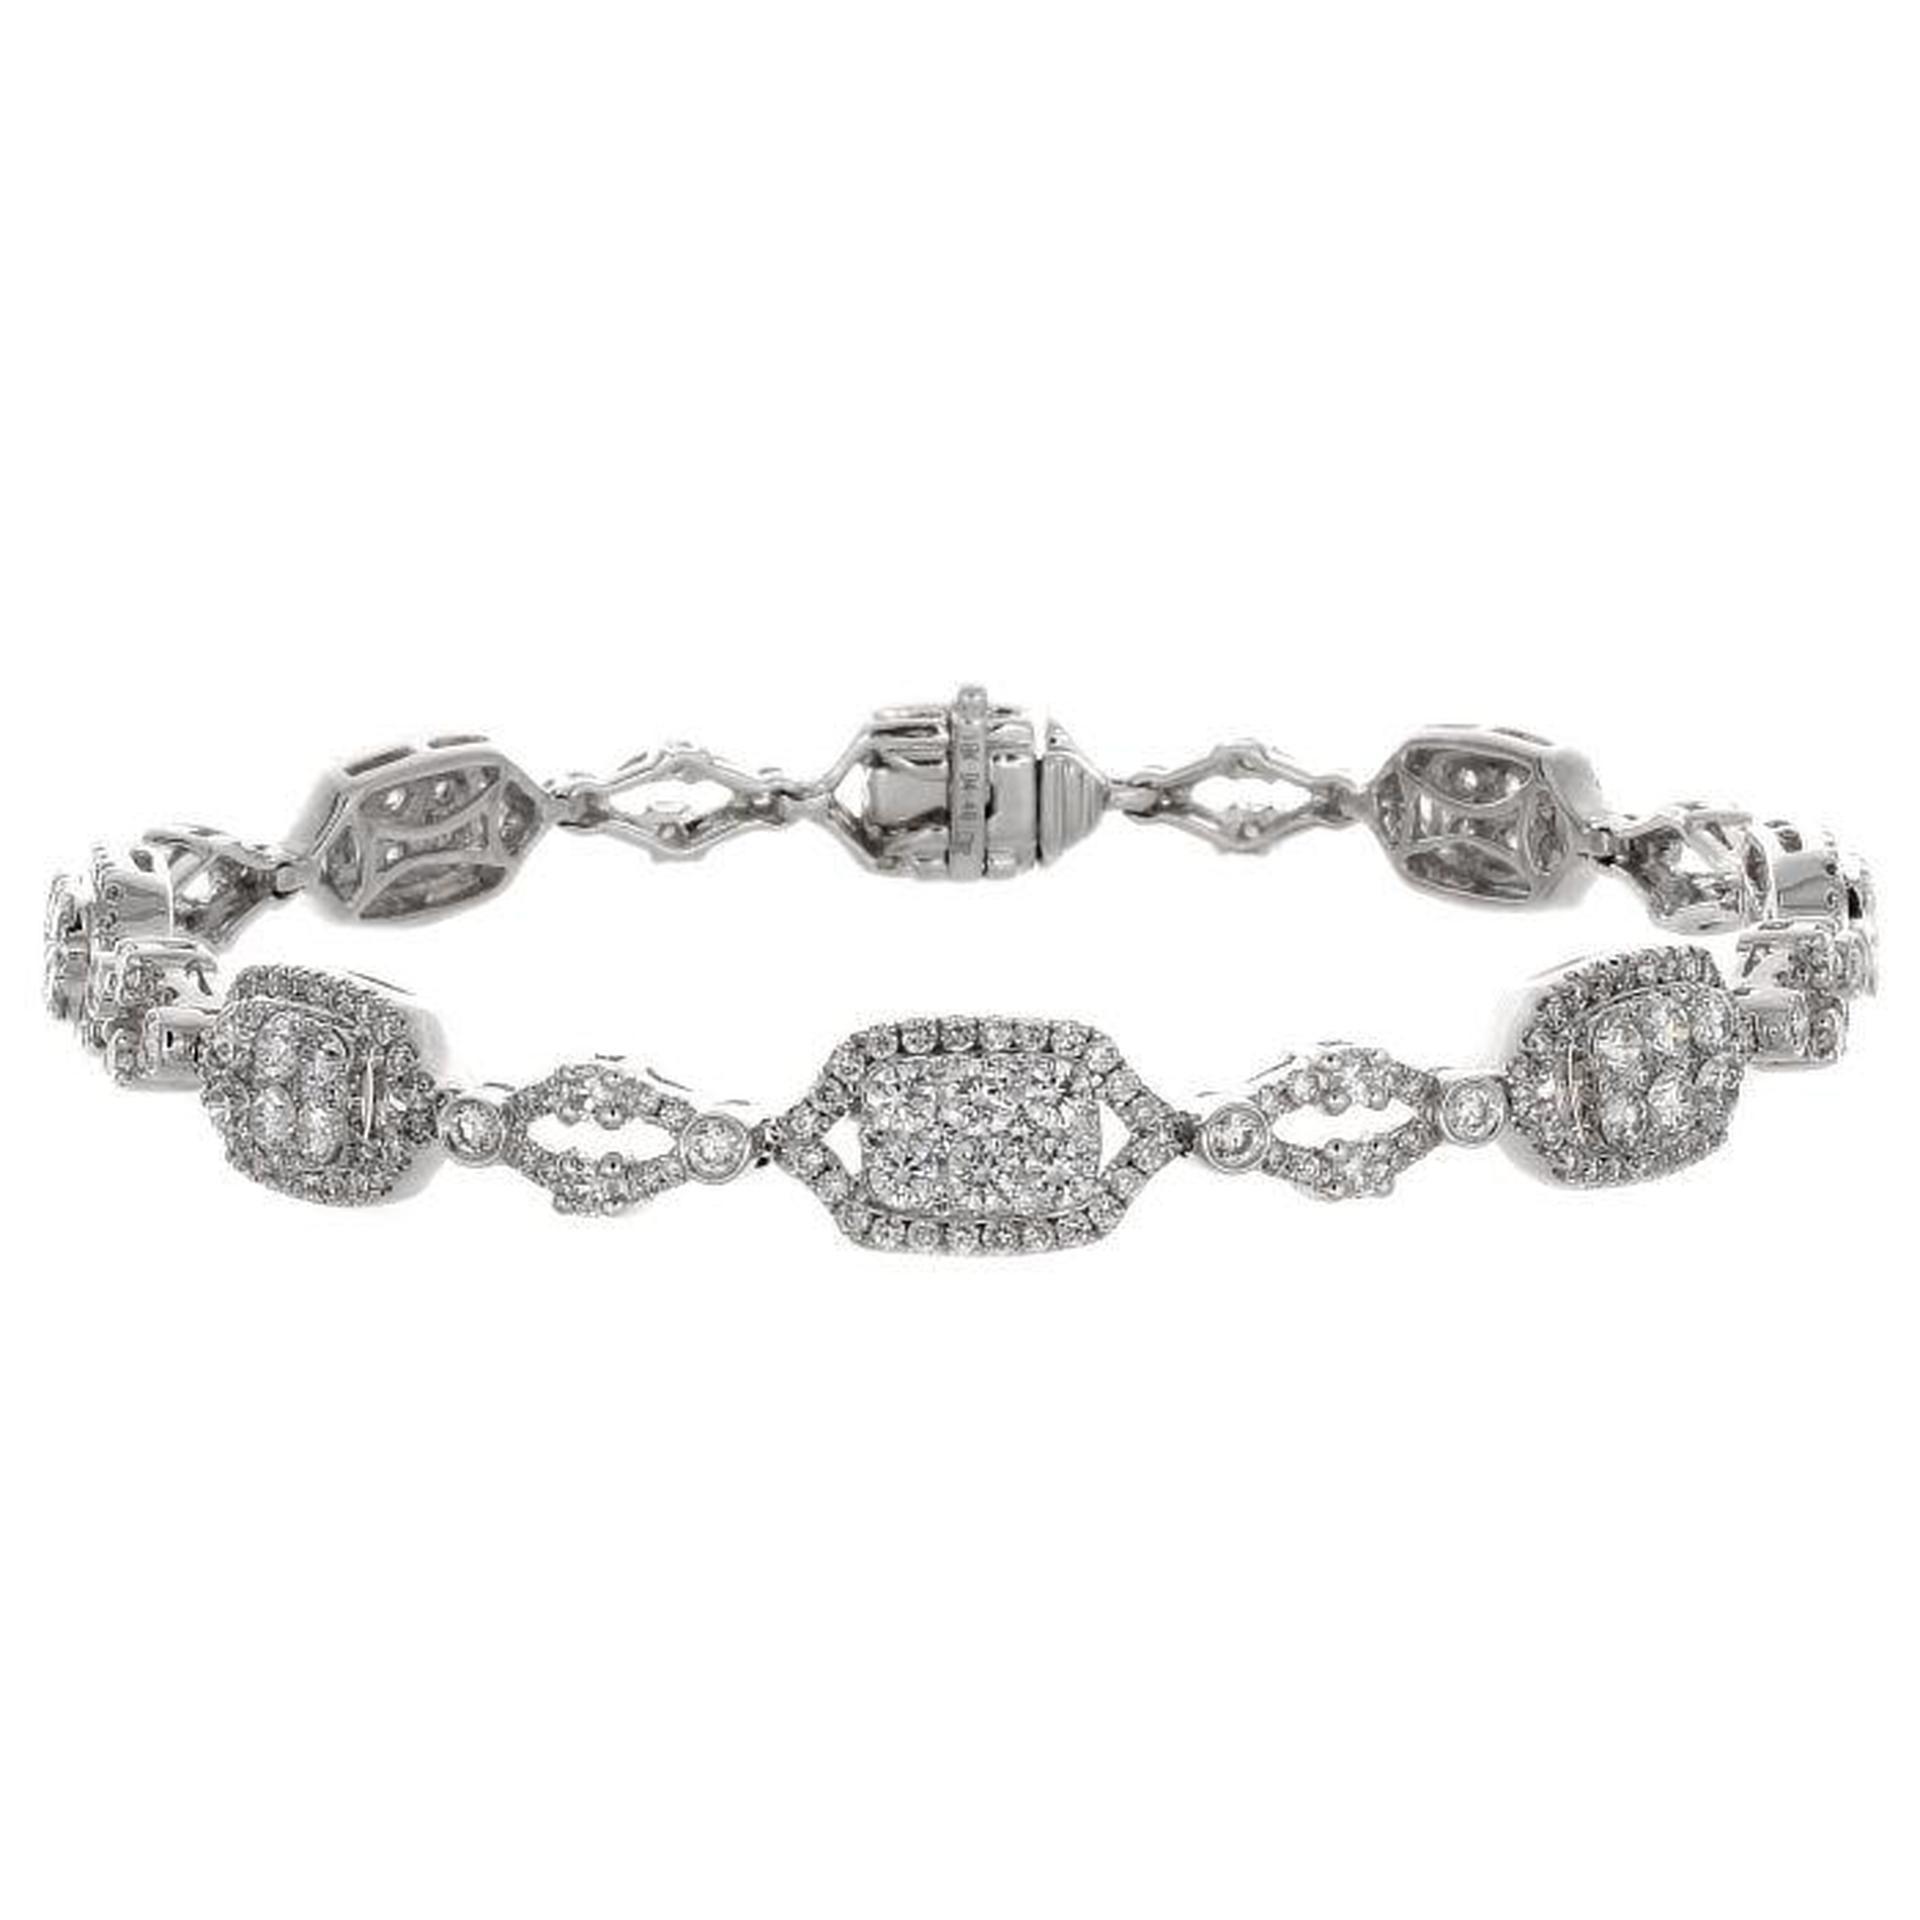 18ct White Gold Diamond Set Link Bracelet